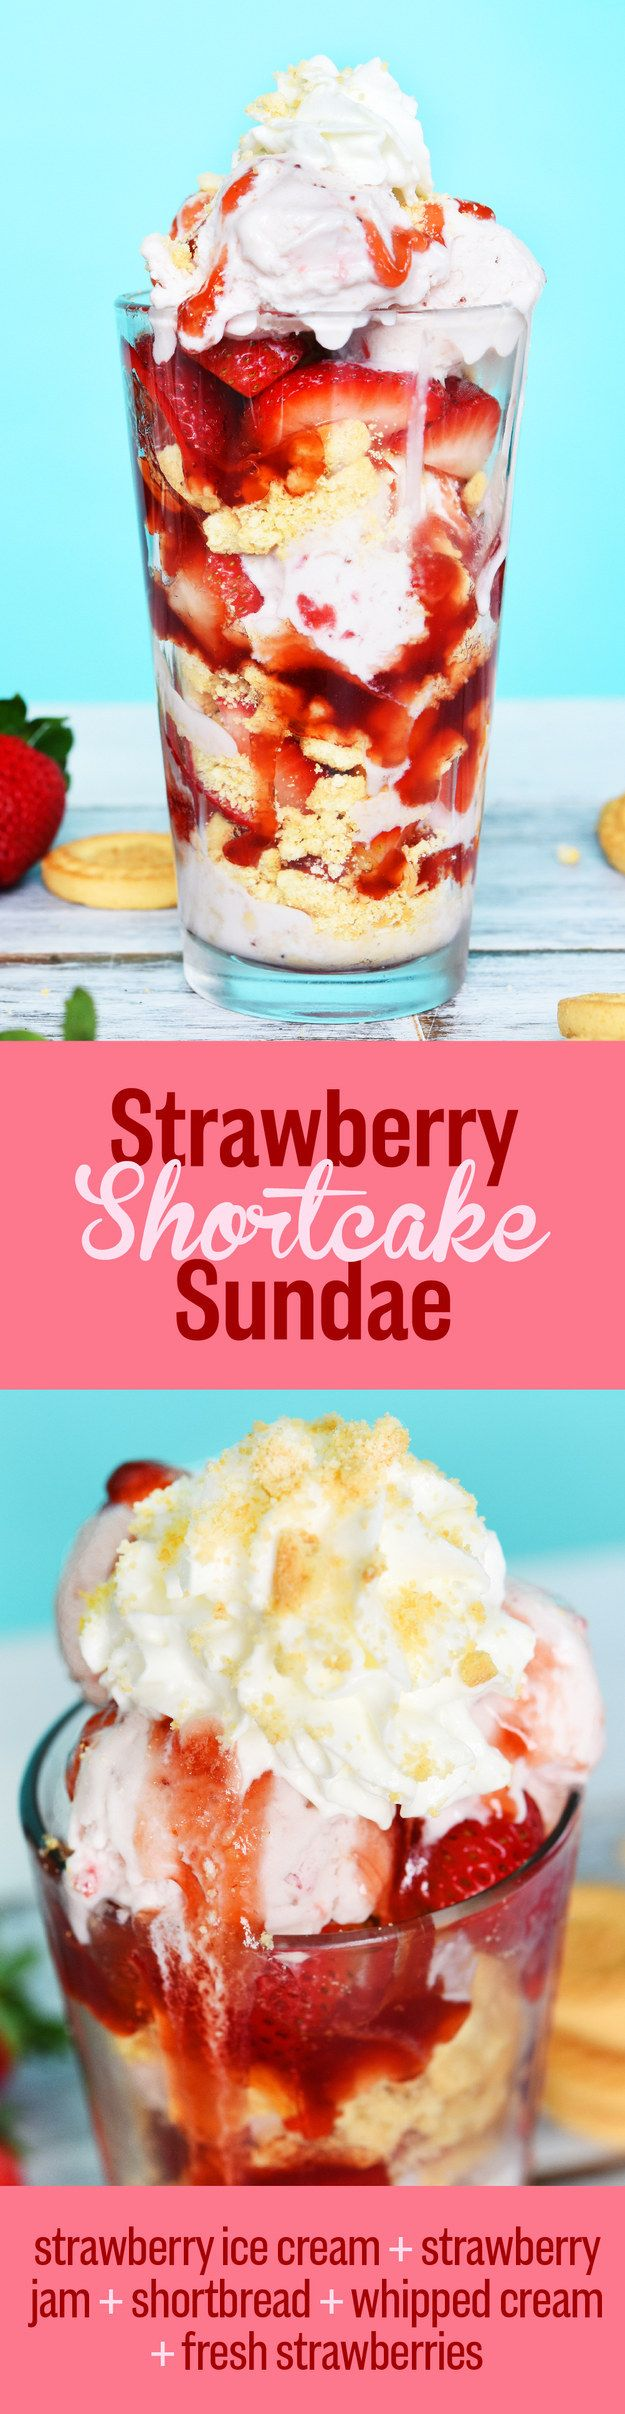 Strawberry Shortcake Sundae                                                                                                                                                      More